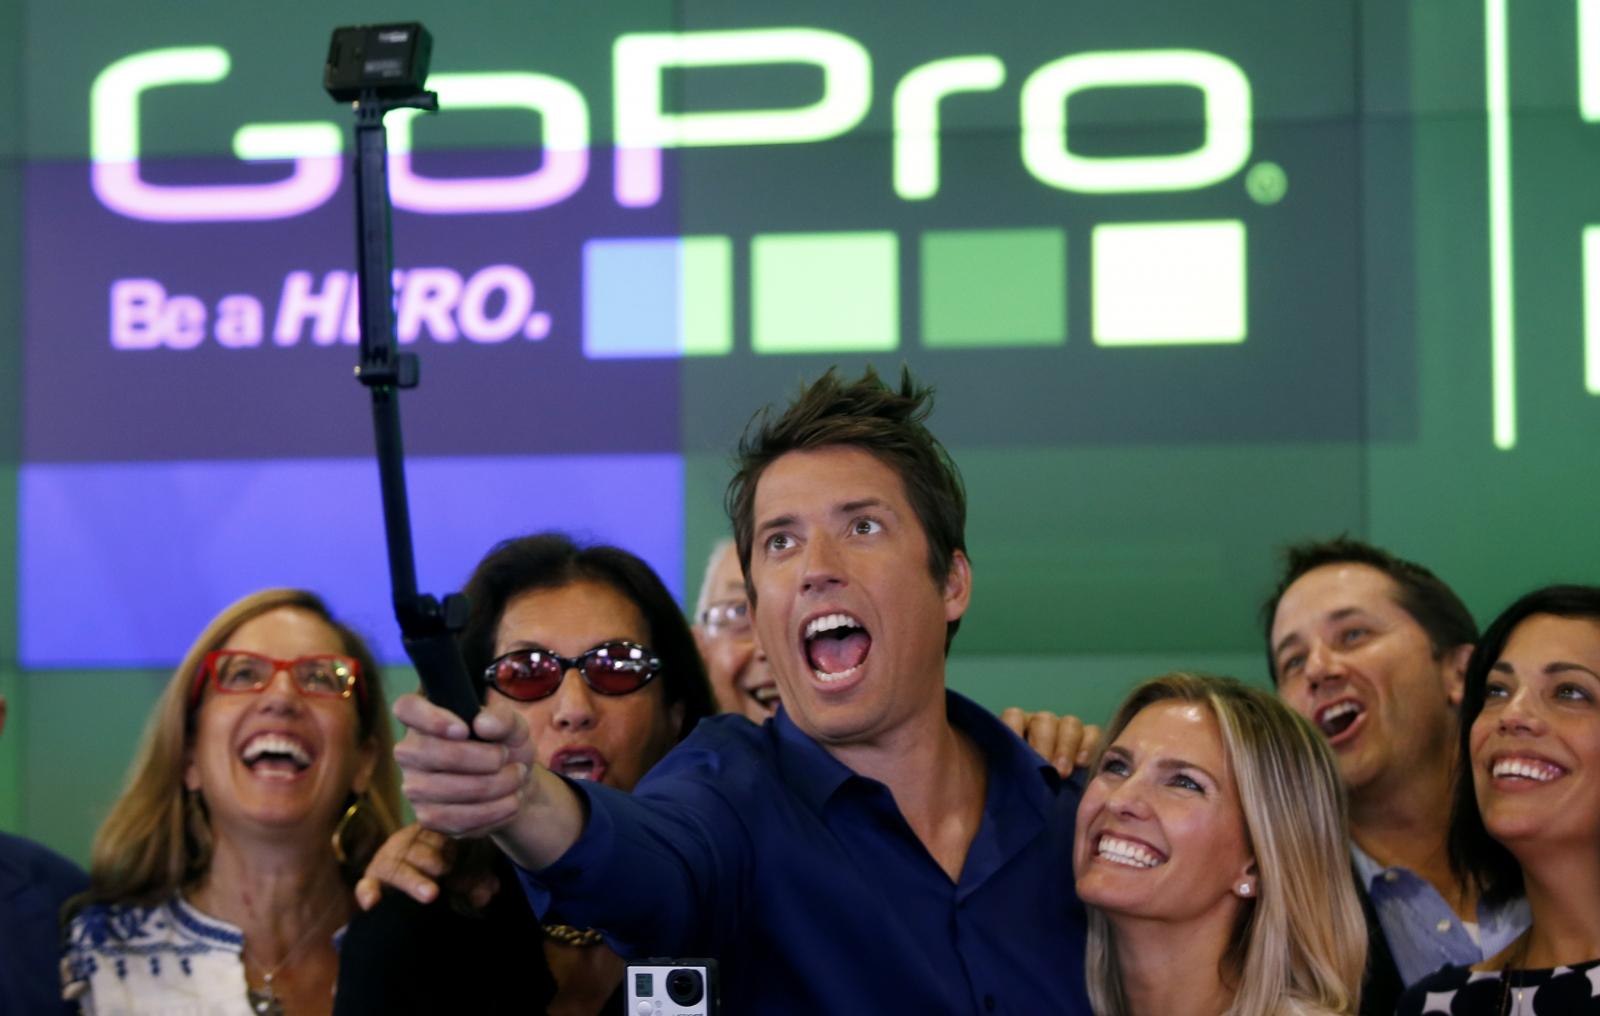 GoPro CEO Nick Woodman